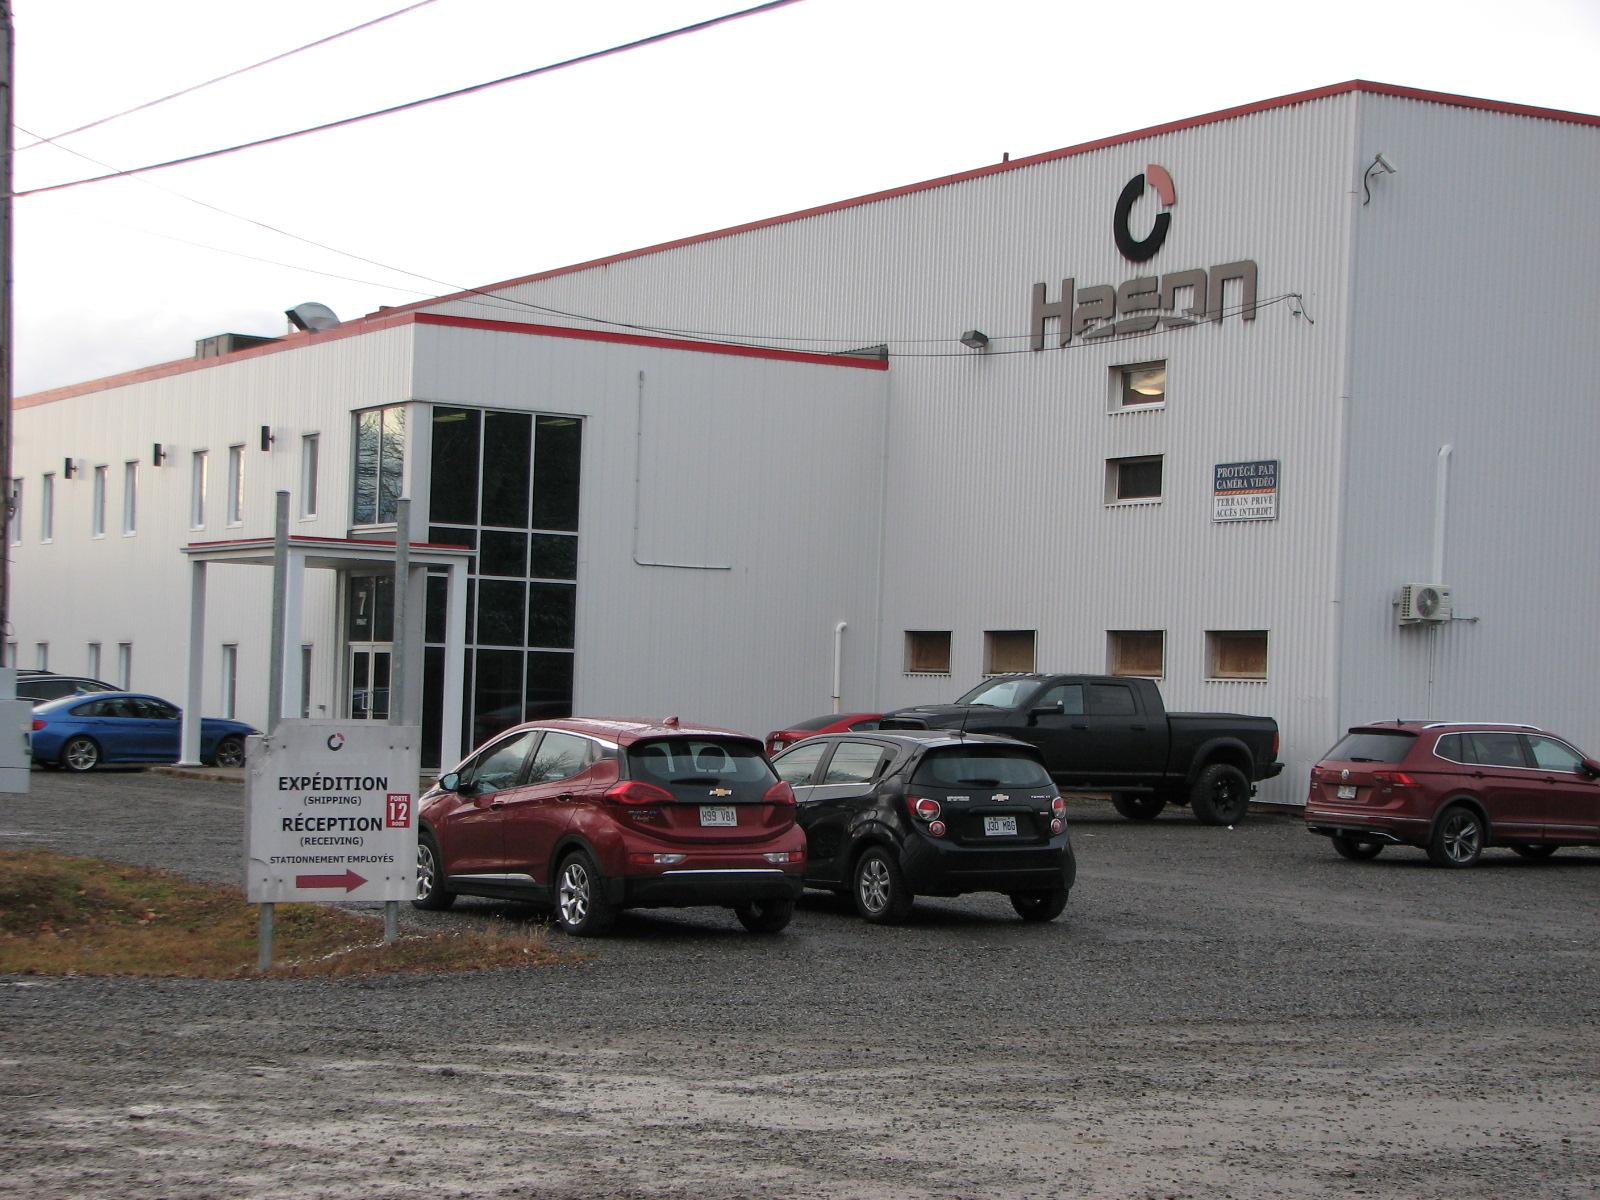 Hason usine